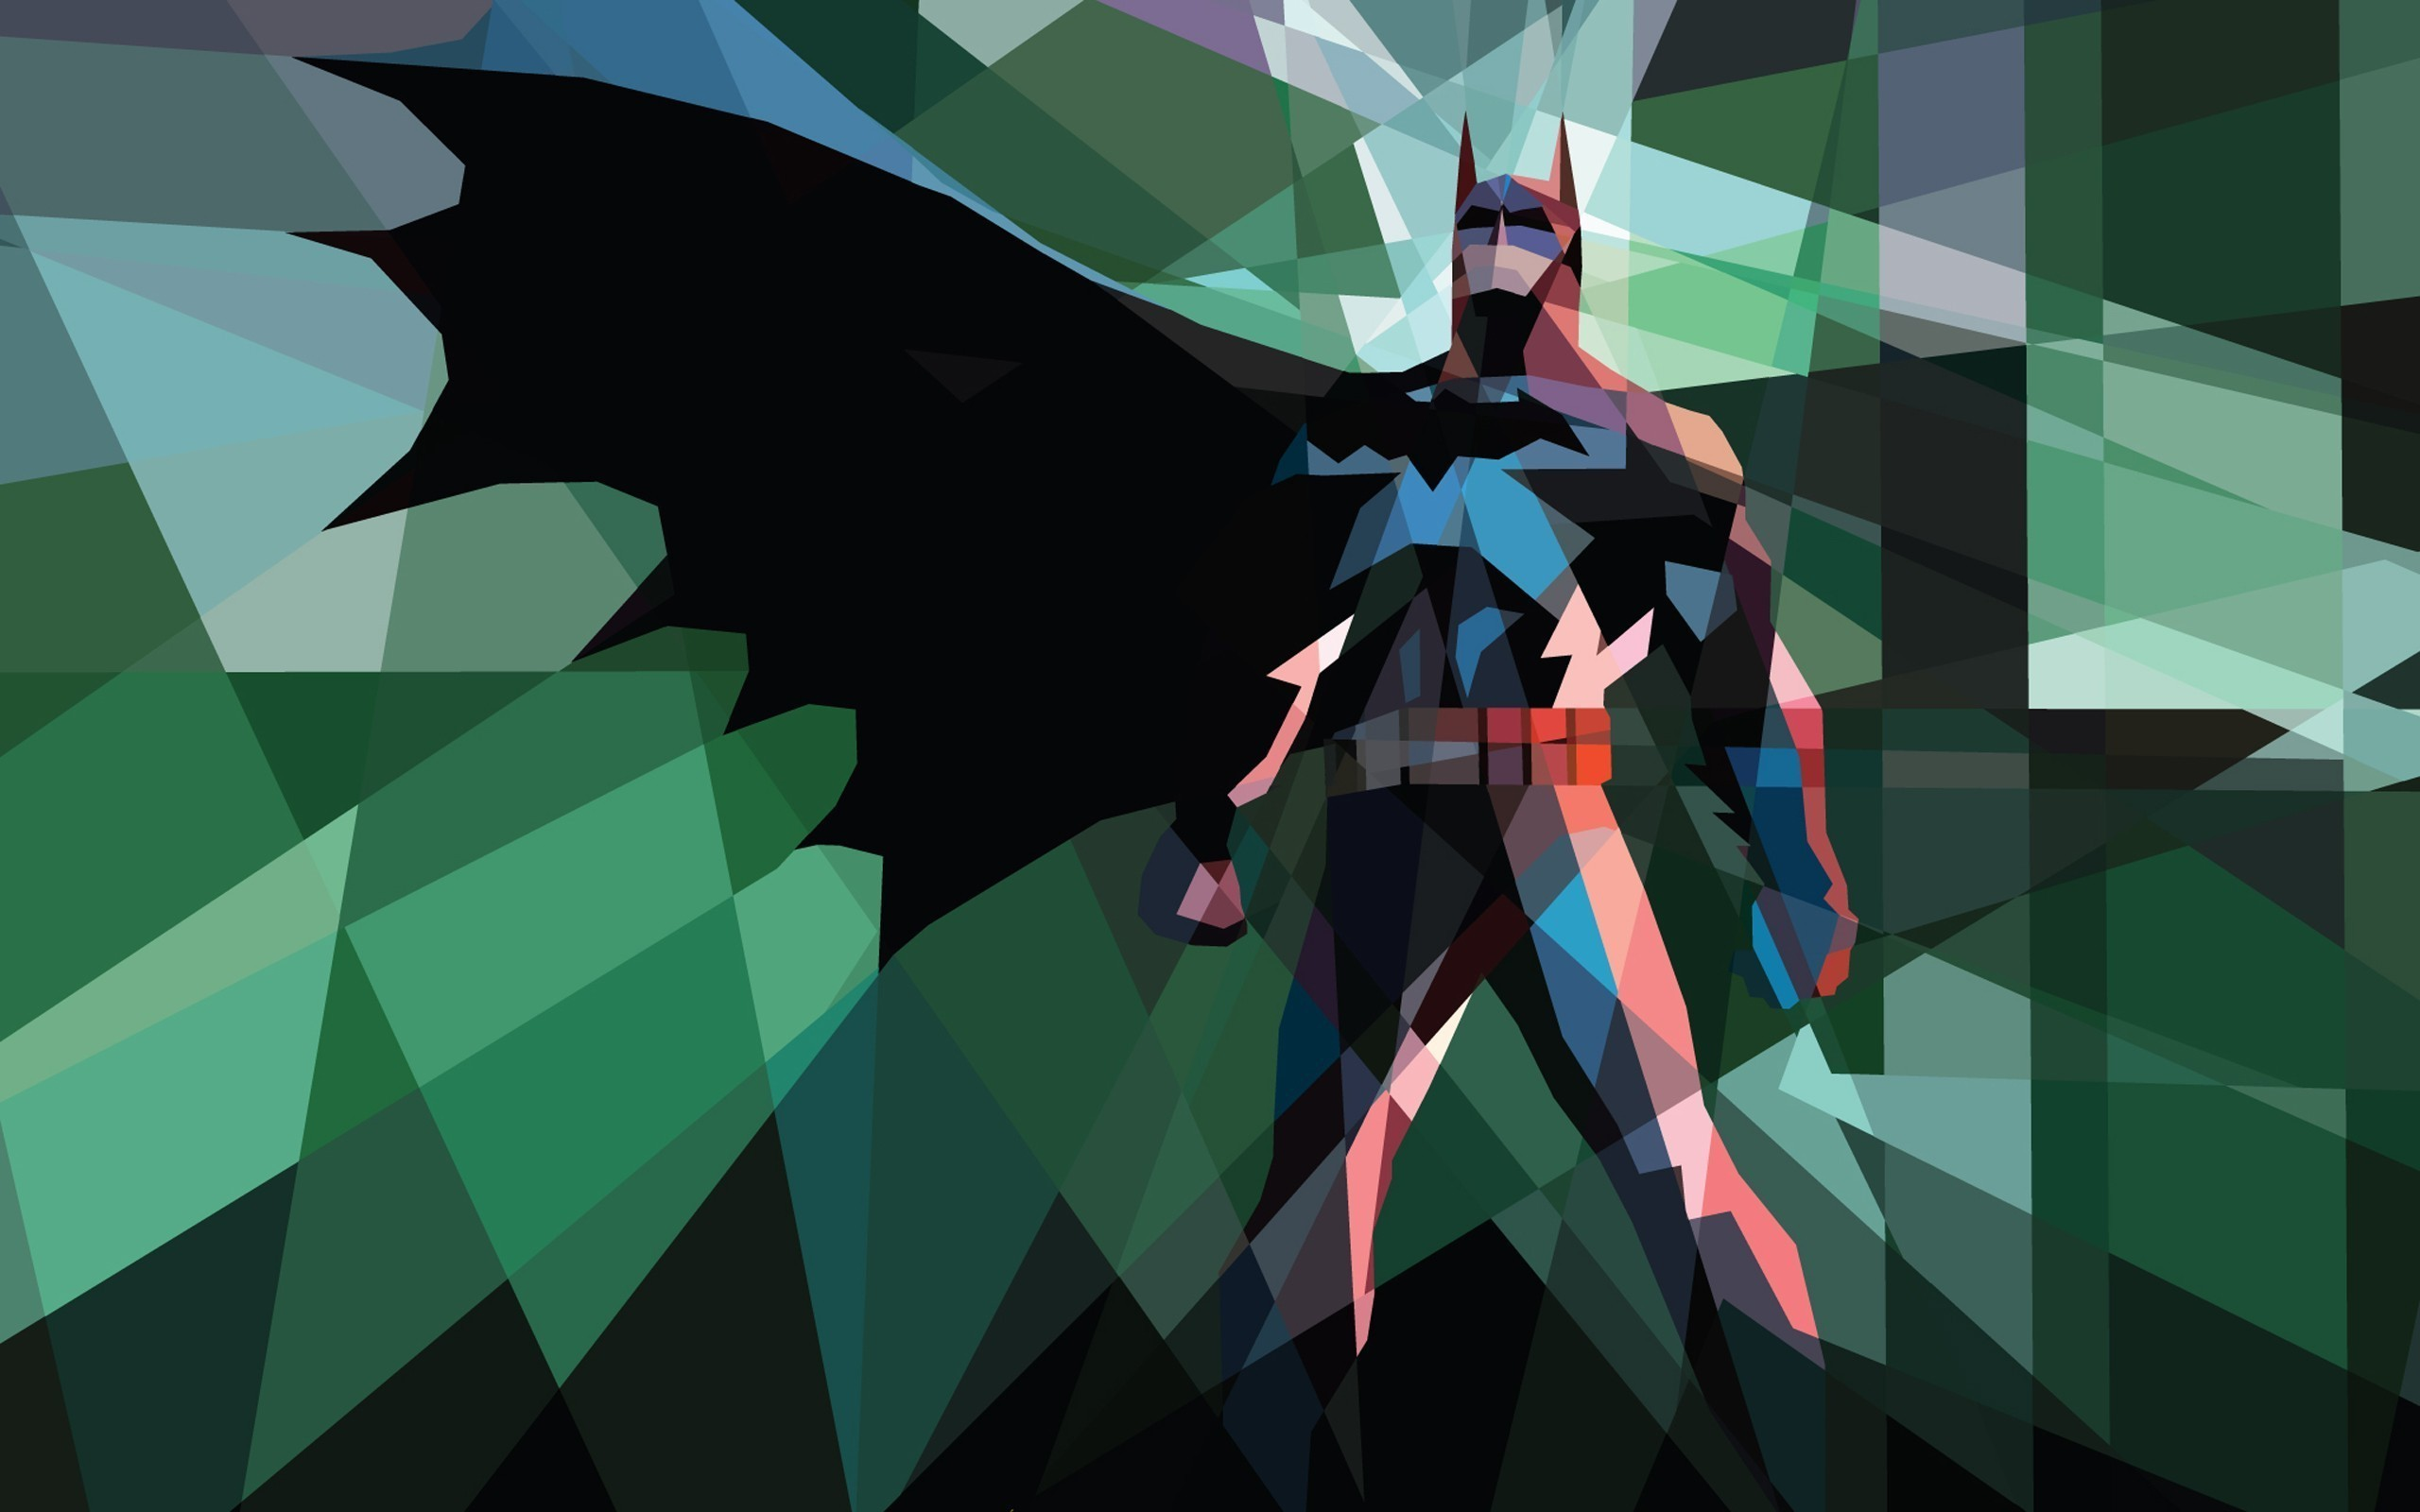 Batman movie cover – Mi Free Wallpapers | HD Static Wallpapers | Pinterest  | Movie covers